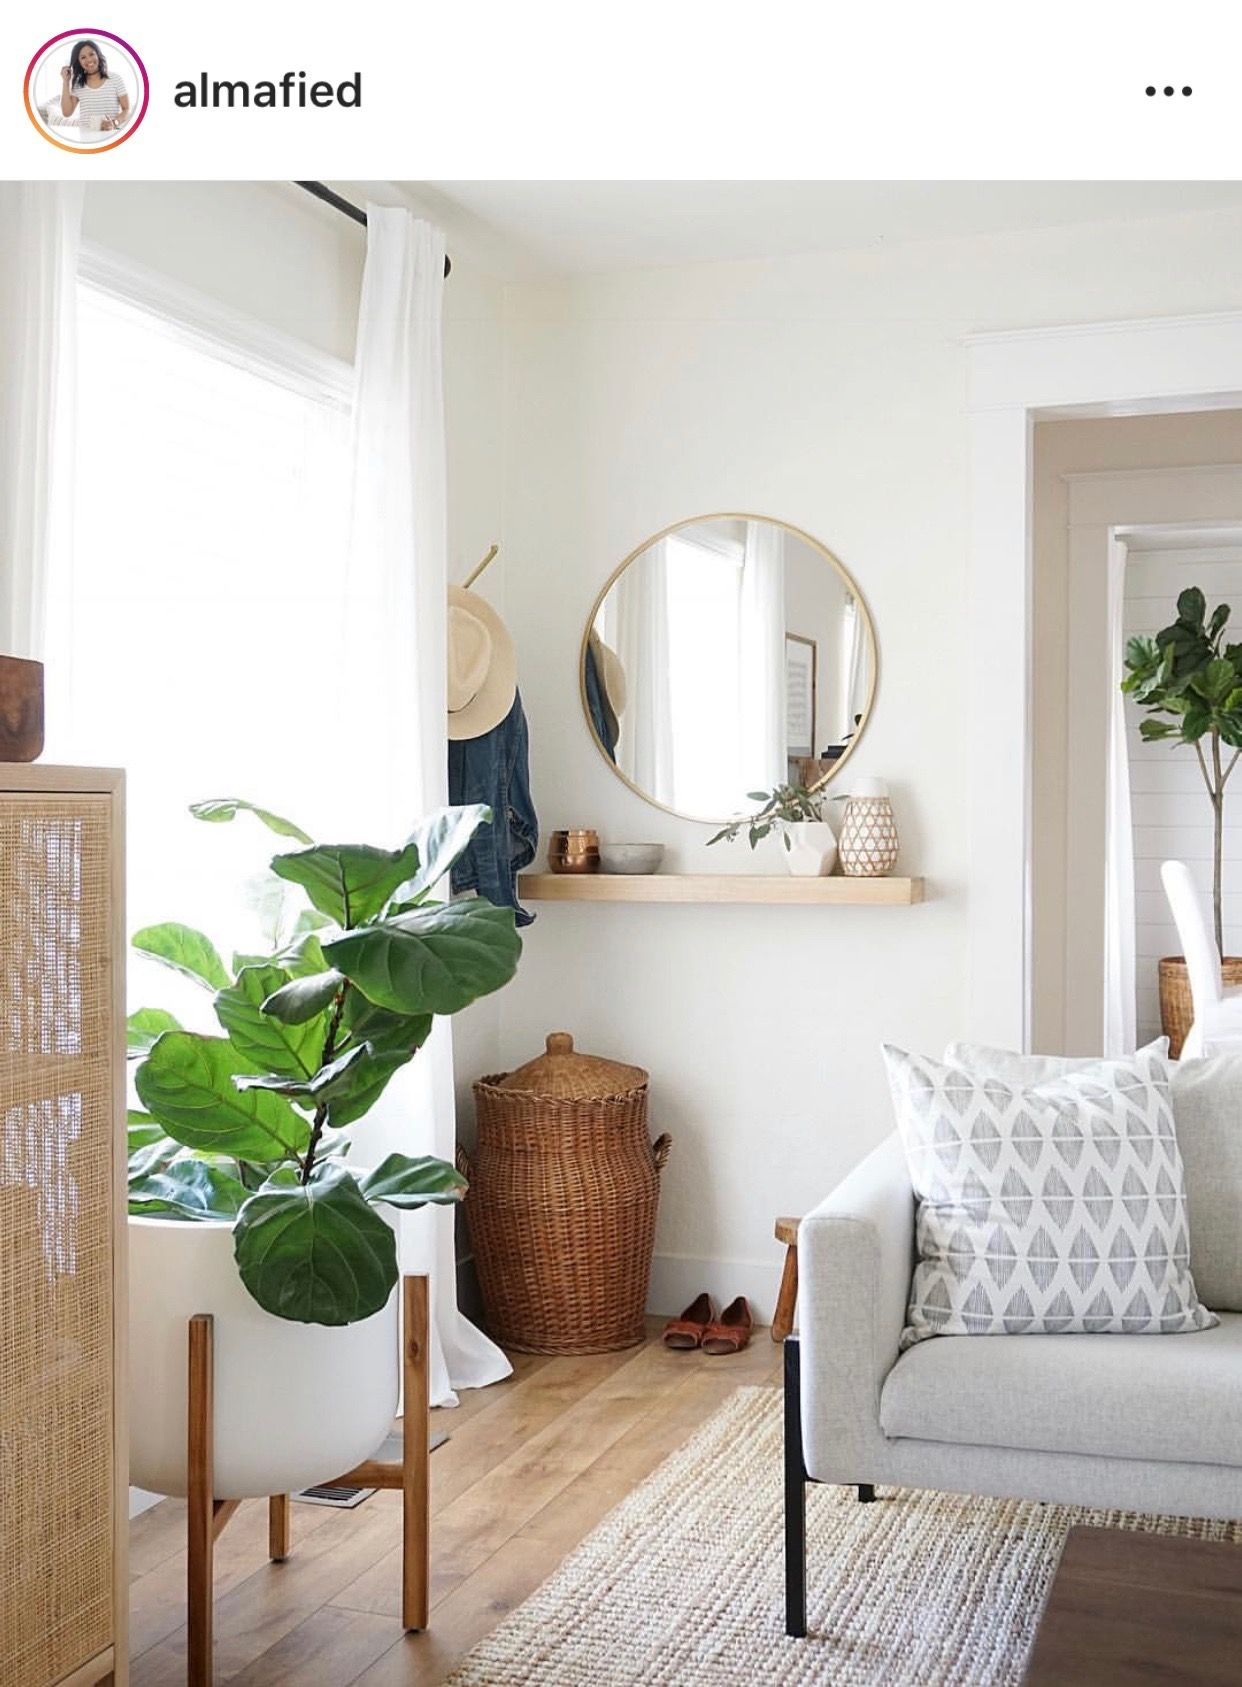 Pin by Megan Rossman on h o m e Living room mirrors